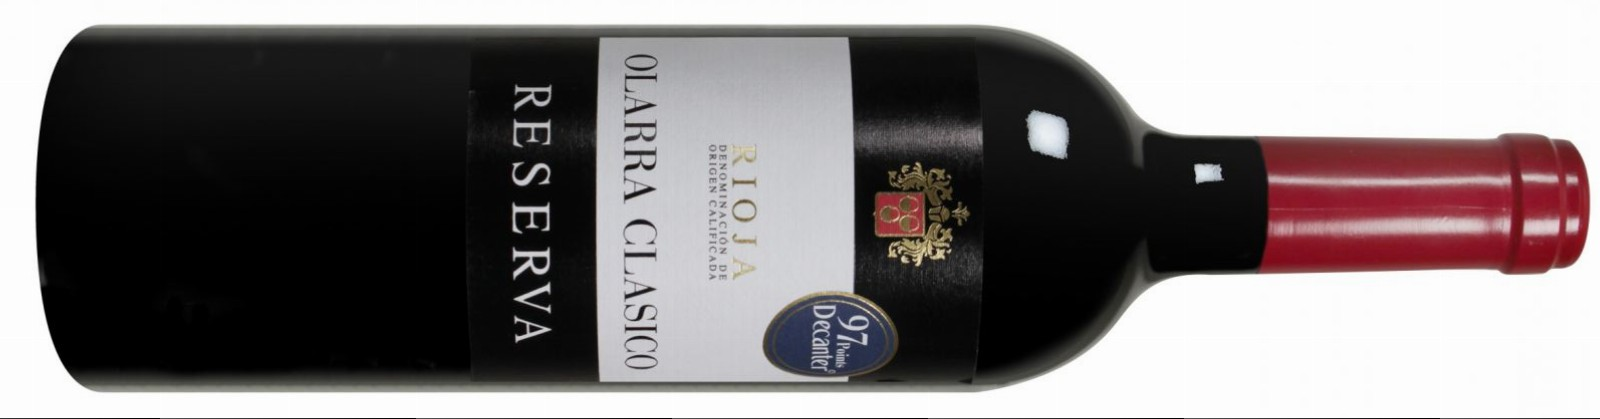 Olarra Clasico Rioja Reserva 2009